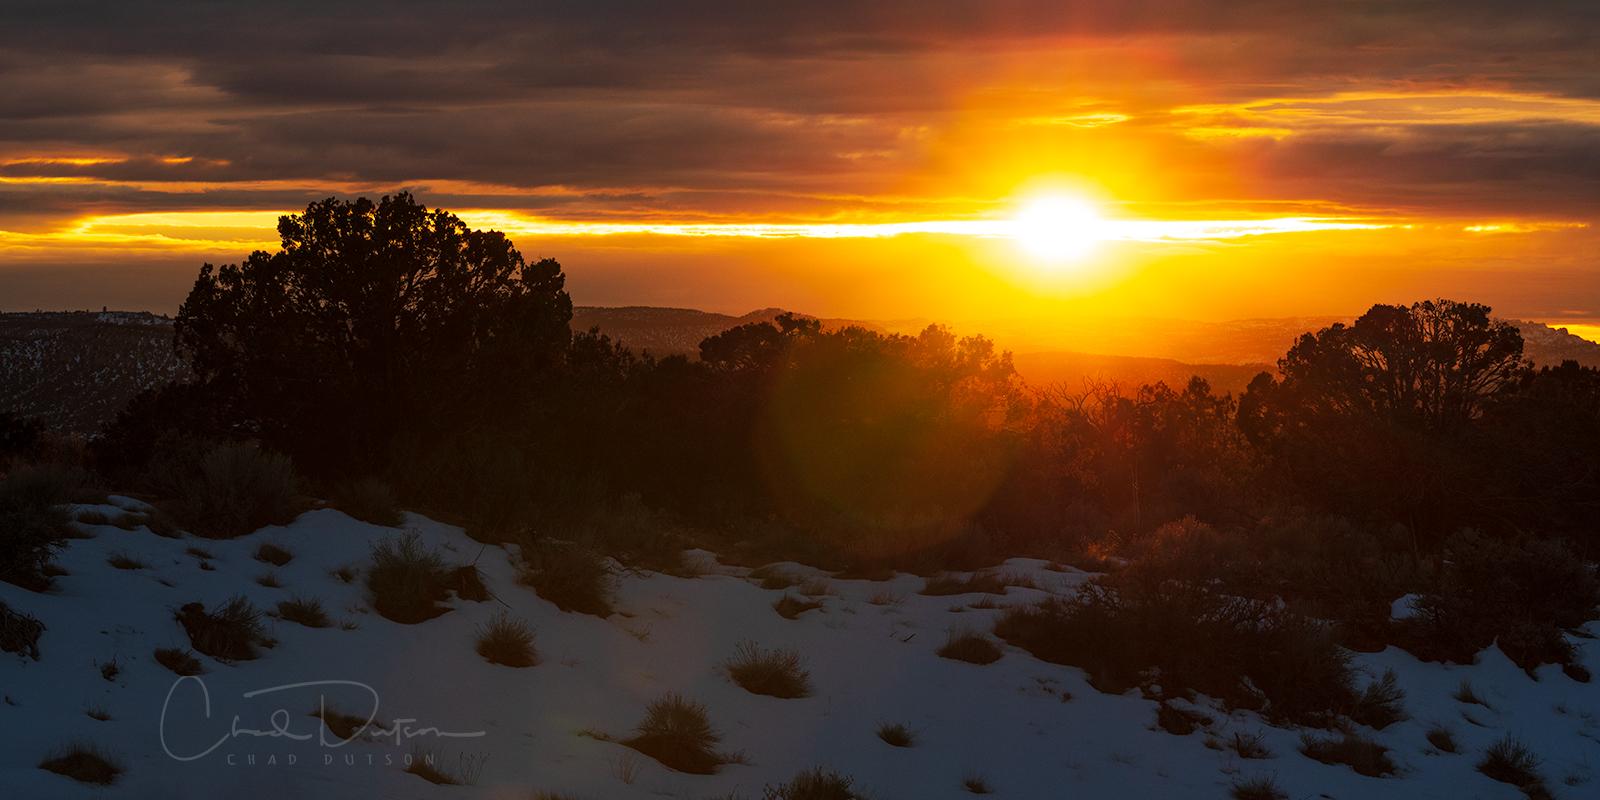 Sunset view, near Kanab, Utah